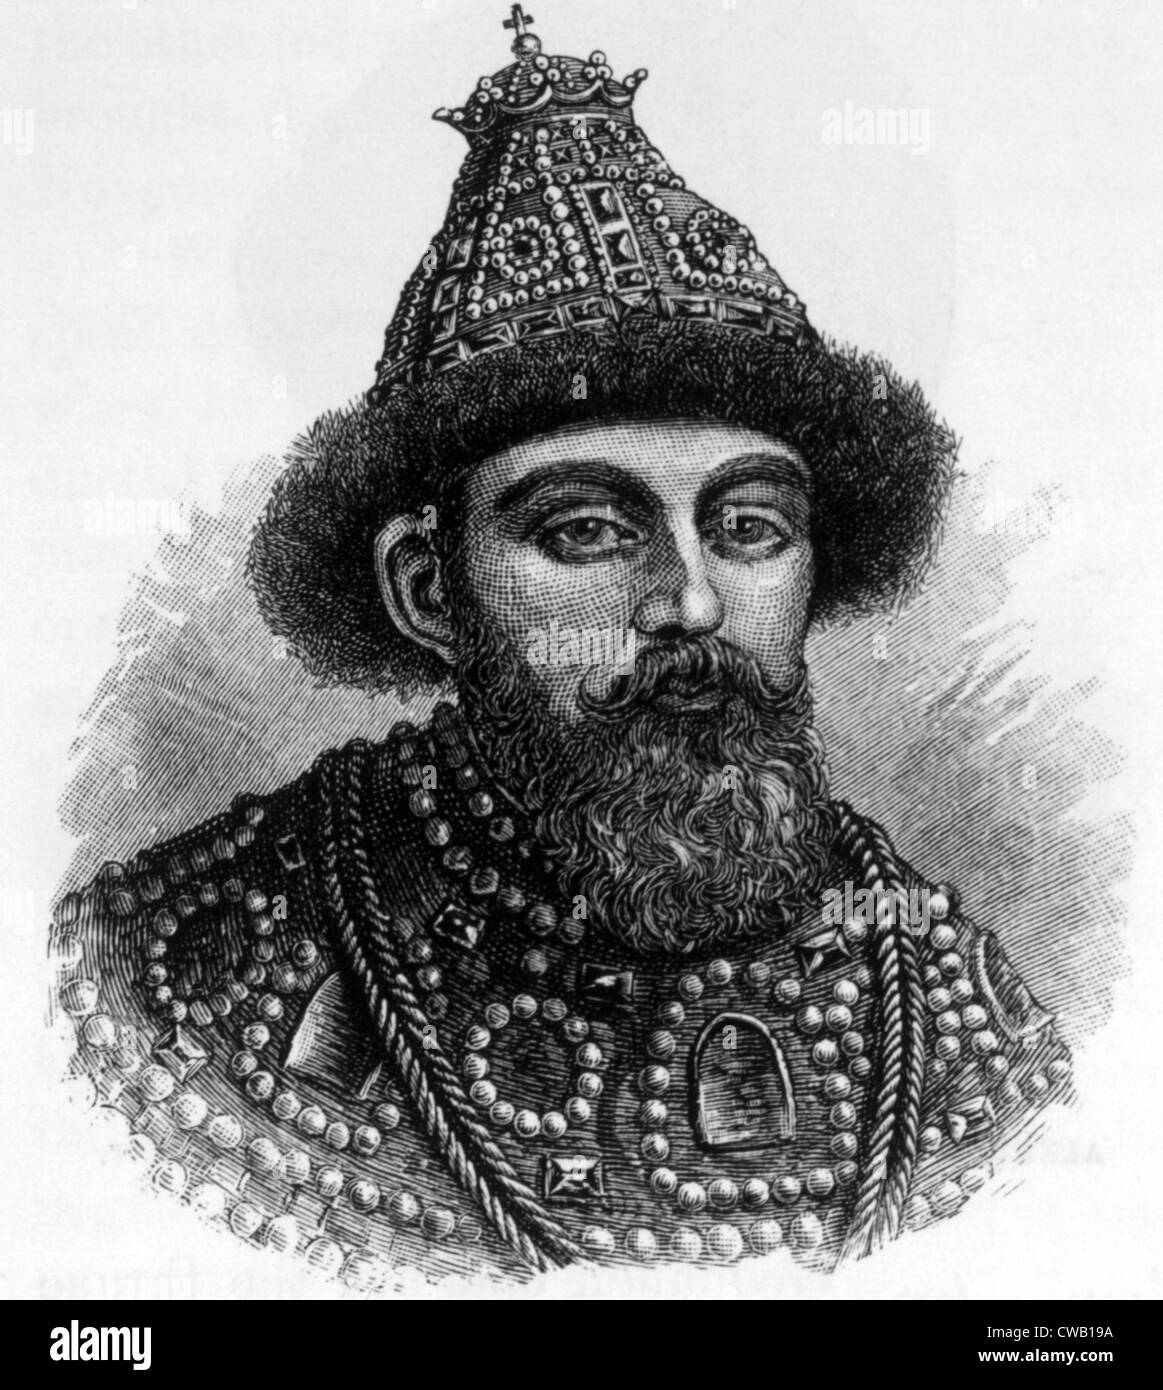 Czar Michael Feodorovitch (aka Michael Romanoff) (1596-1645), founder of the Romanoff dynasty, engraving 1886 - Stock Image